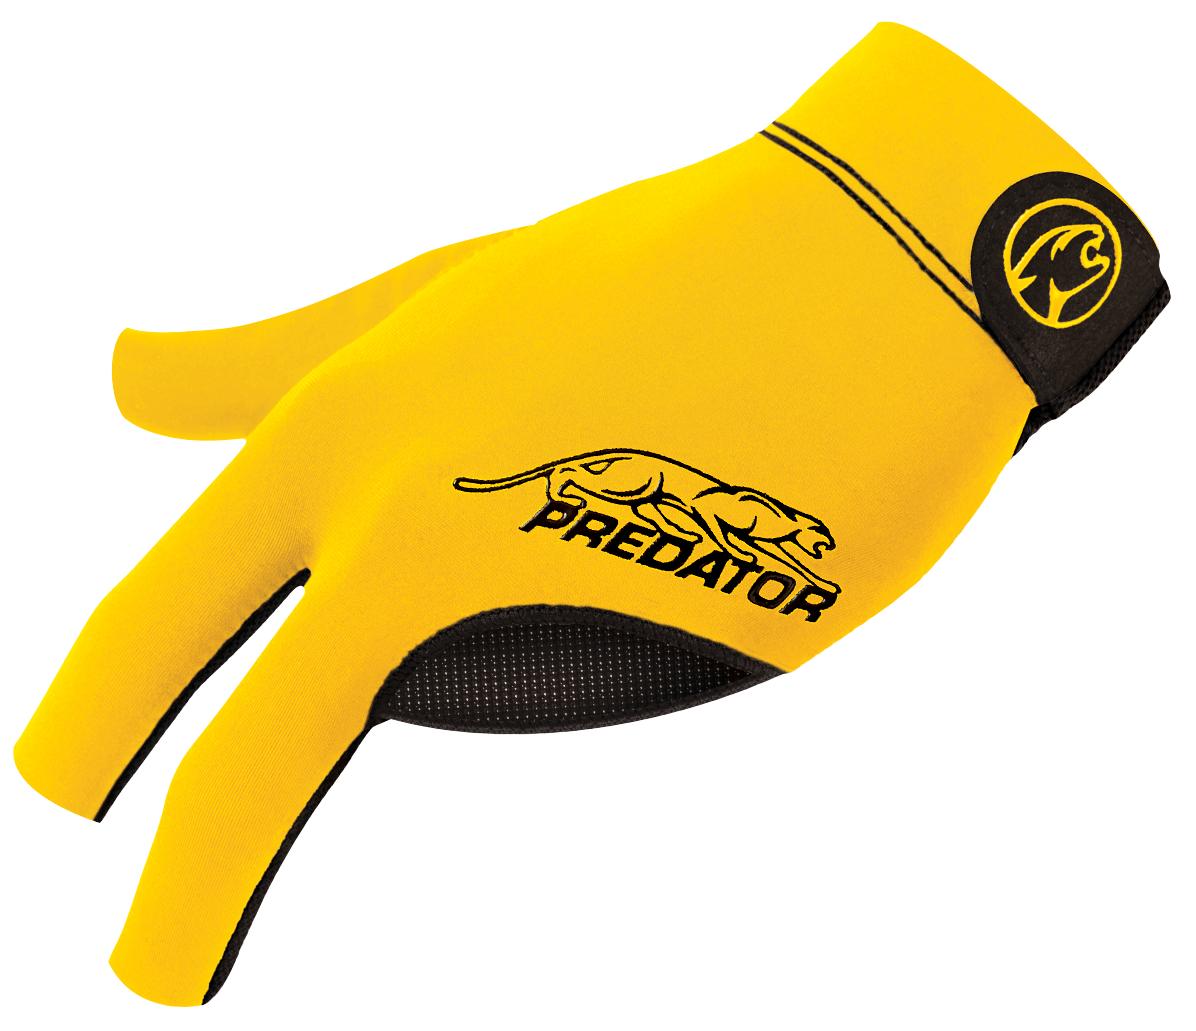 Predator Glove - BGLPN - Second Skin Yellow - Bridge Hand Left